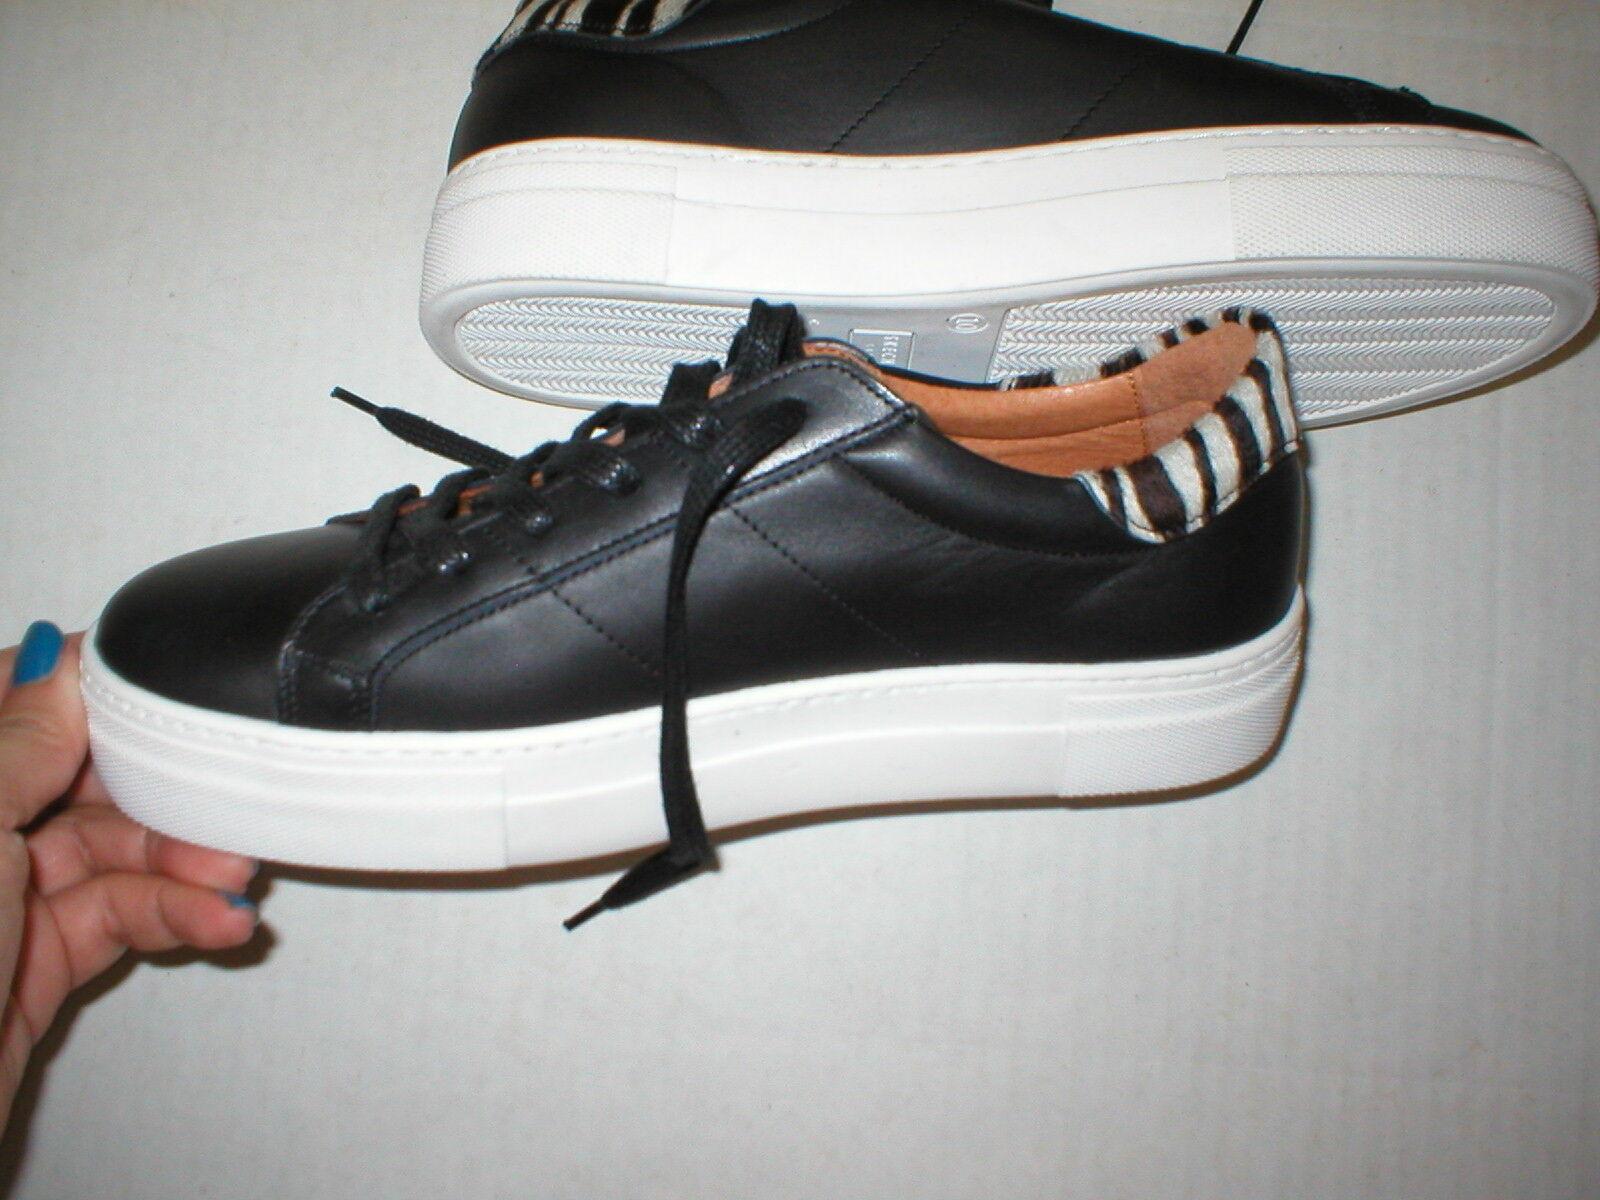 New Womens shoes Fashion Casual Sneakers 7.5 White Black Skechers Street Zebra